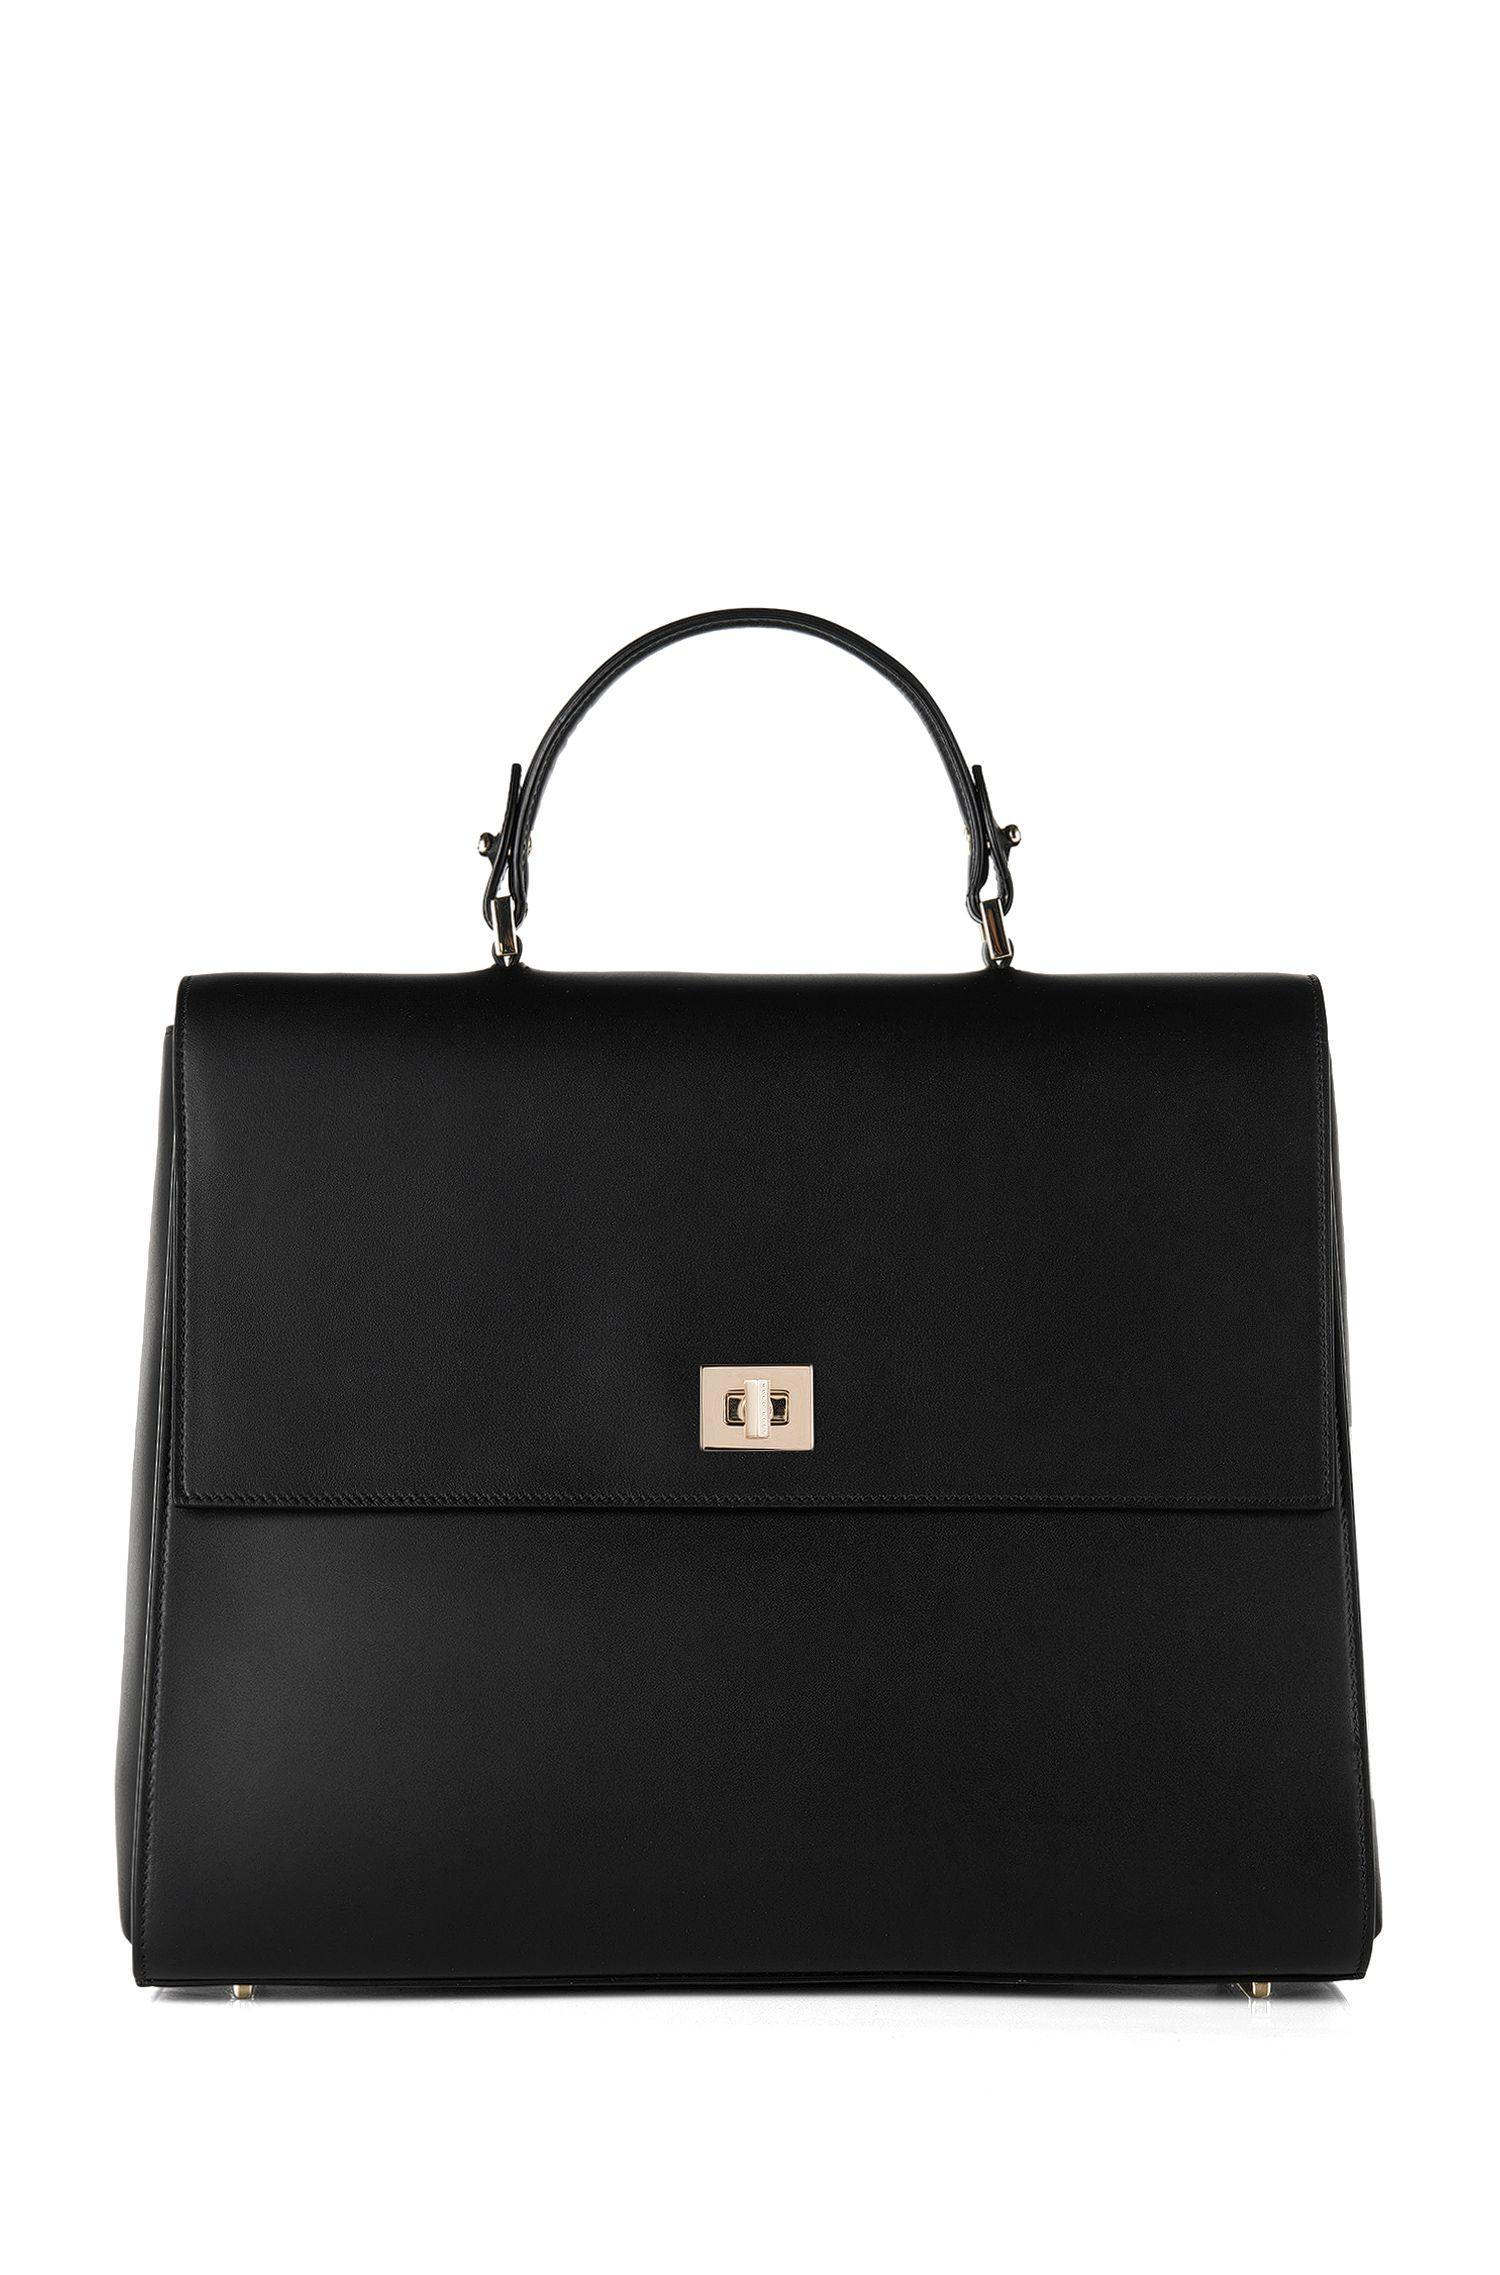 BOSS Bespoke handbag in smooth leather